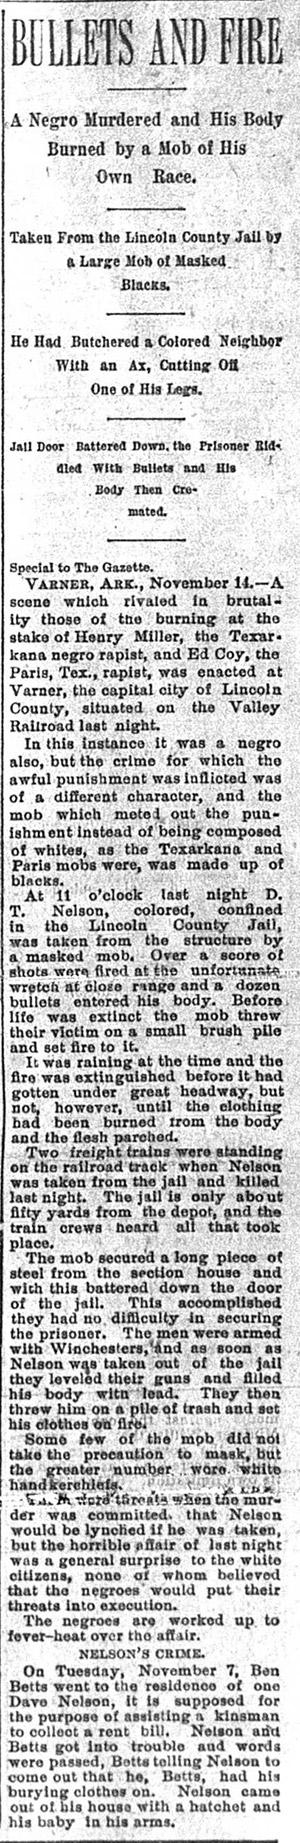 Nelson Lynching Article